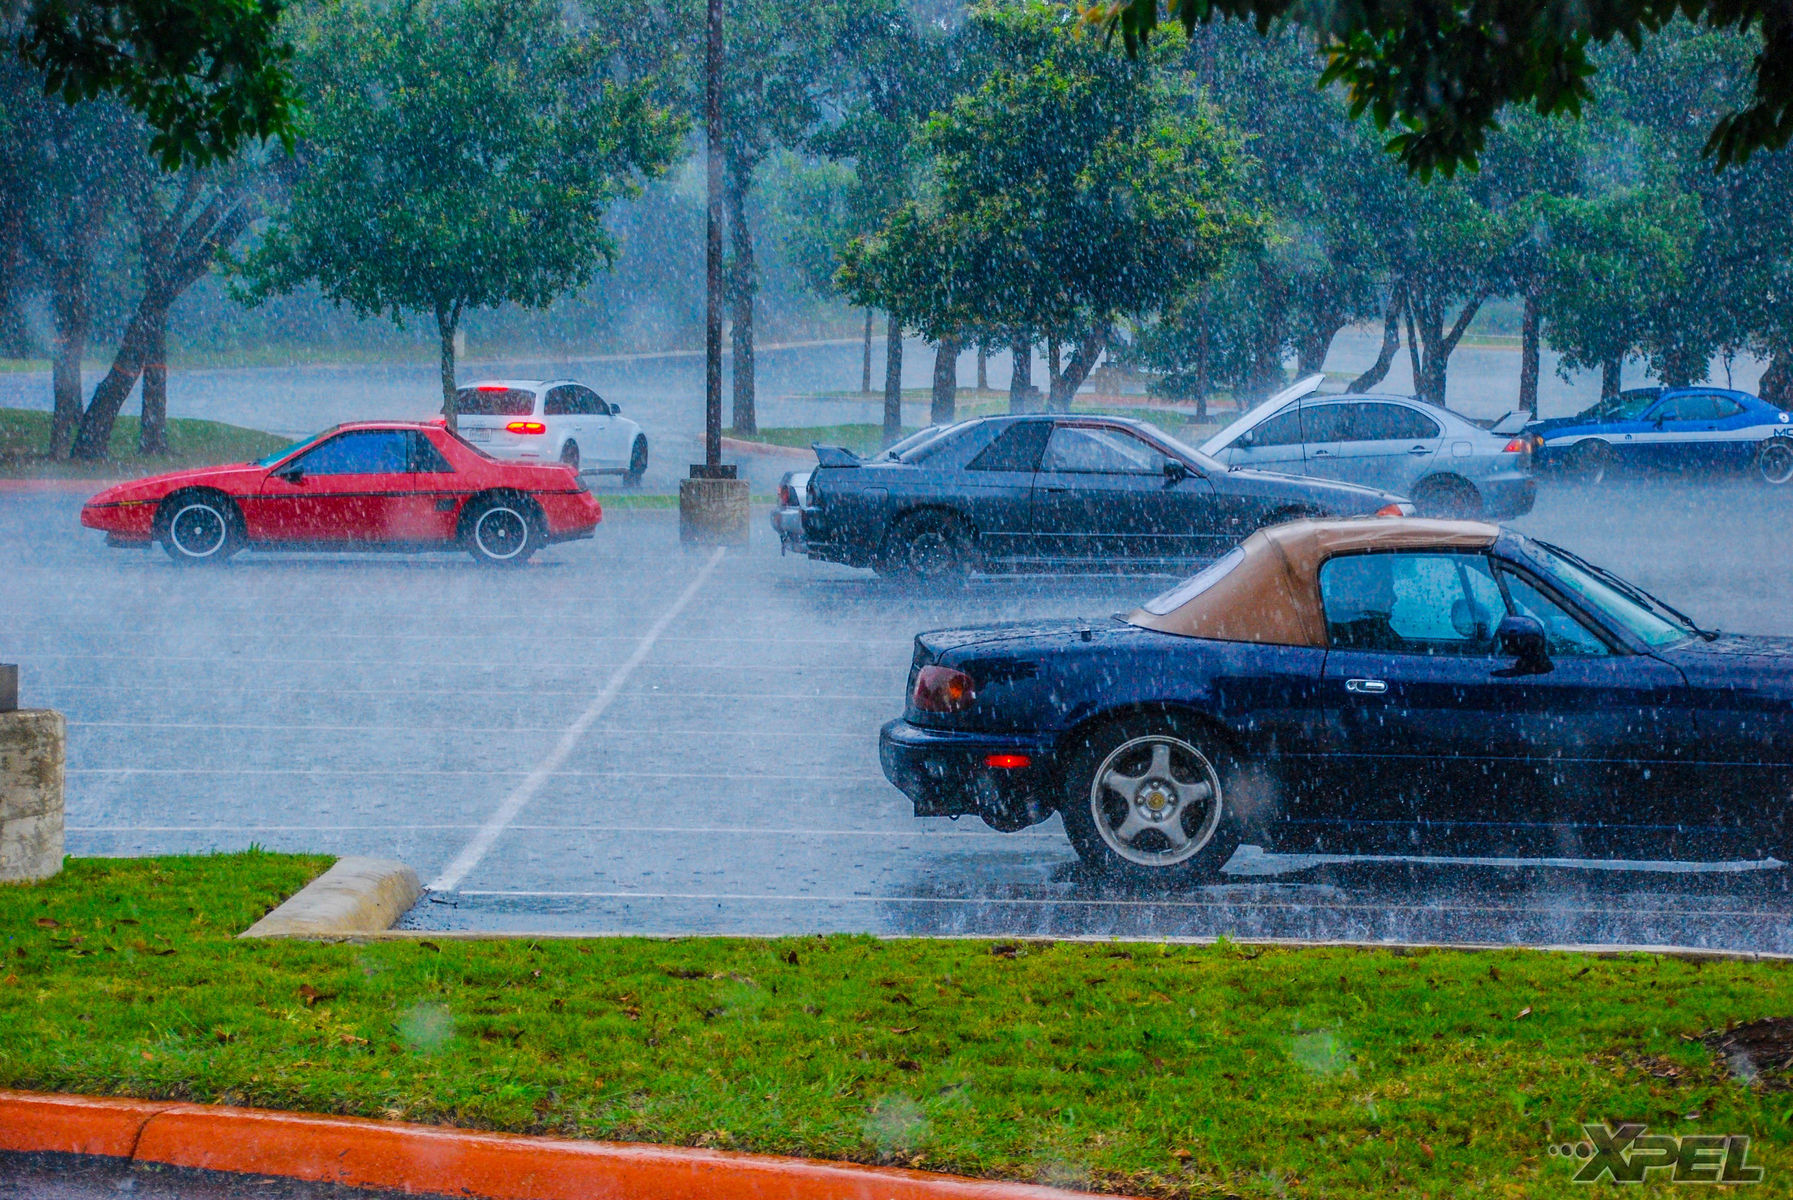   More rain at Cars and Coffee San Antonio